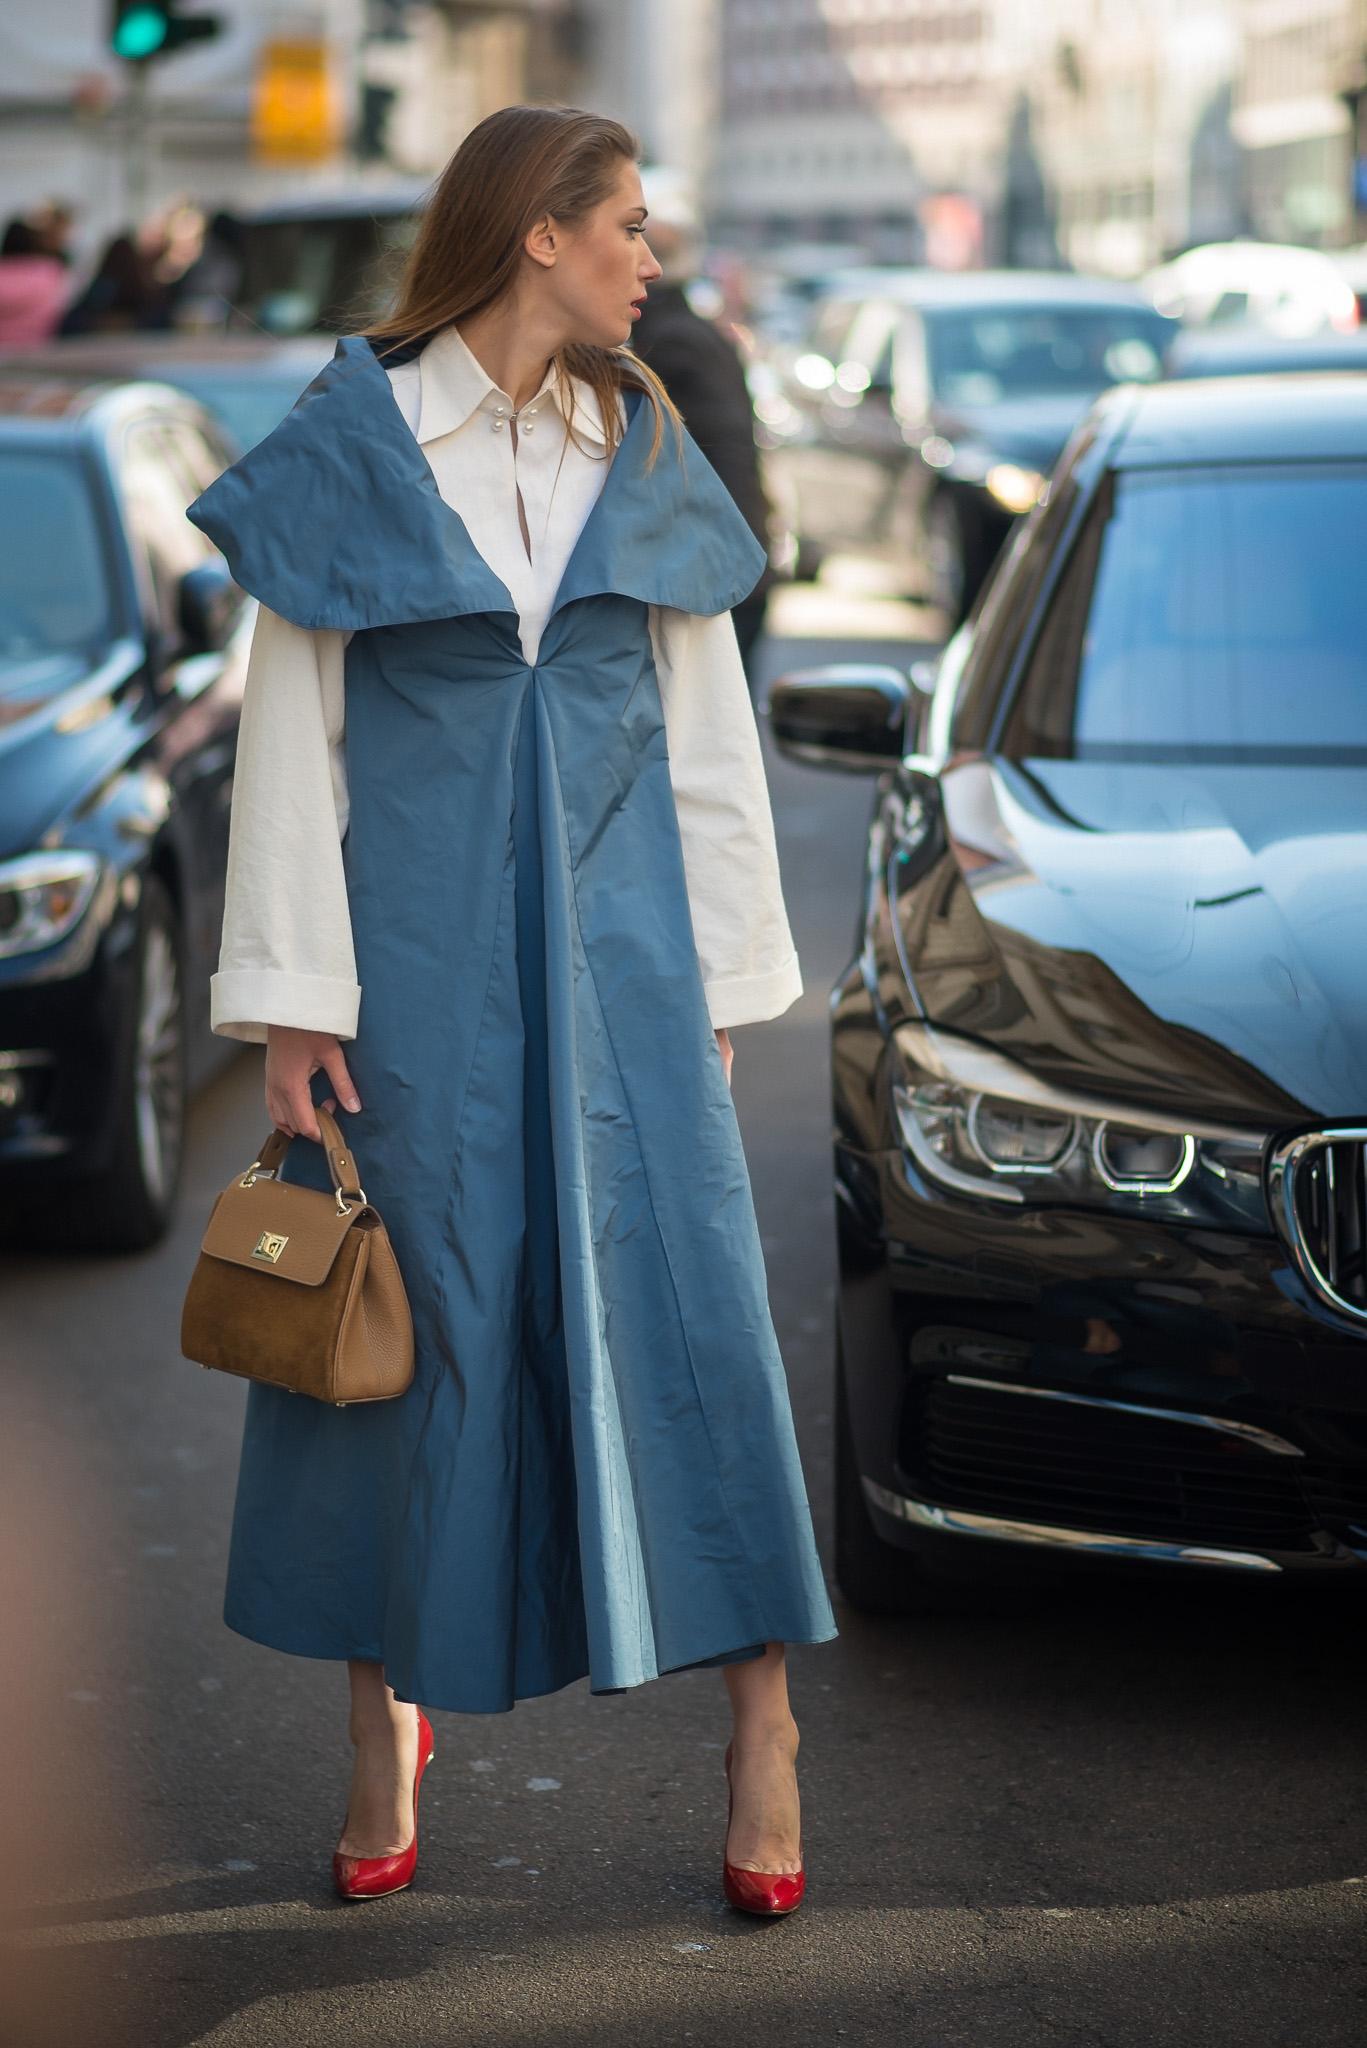 Landina_Street Style Moments_Trussardi_Milan Fashion Week_February 26th 2017_Photography Annika Lagerqvist_www.annikasomething.com